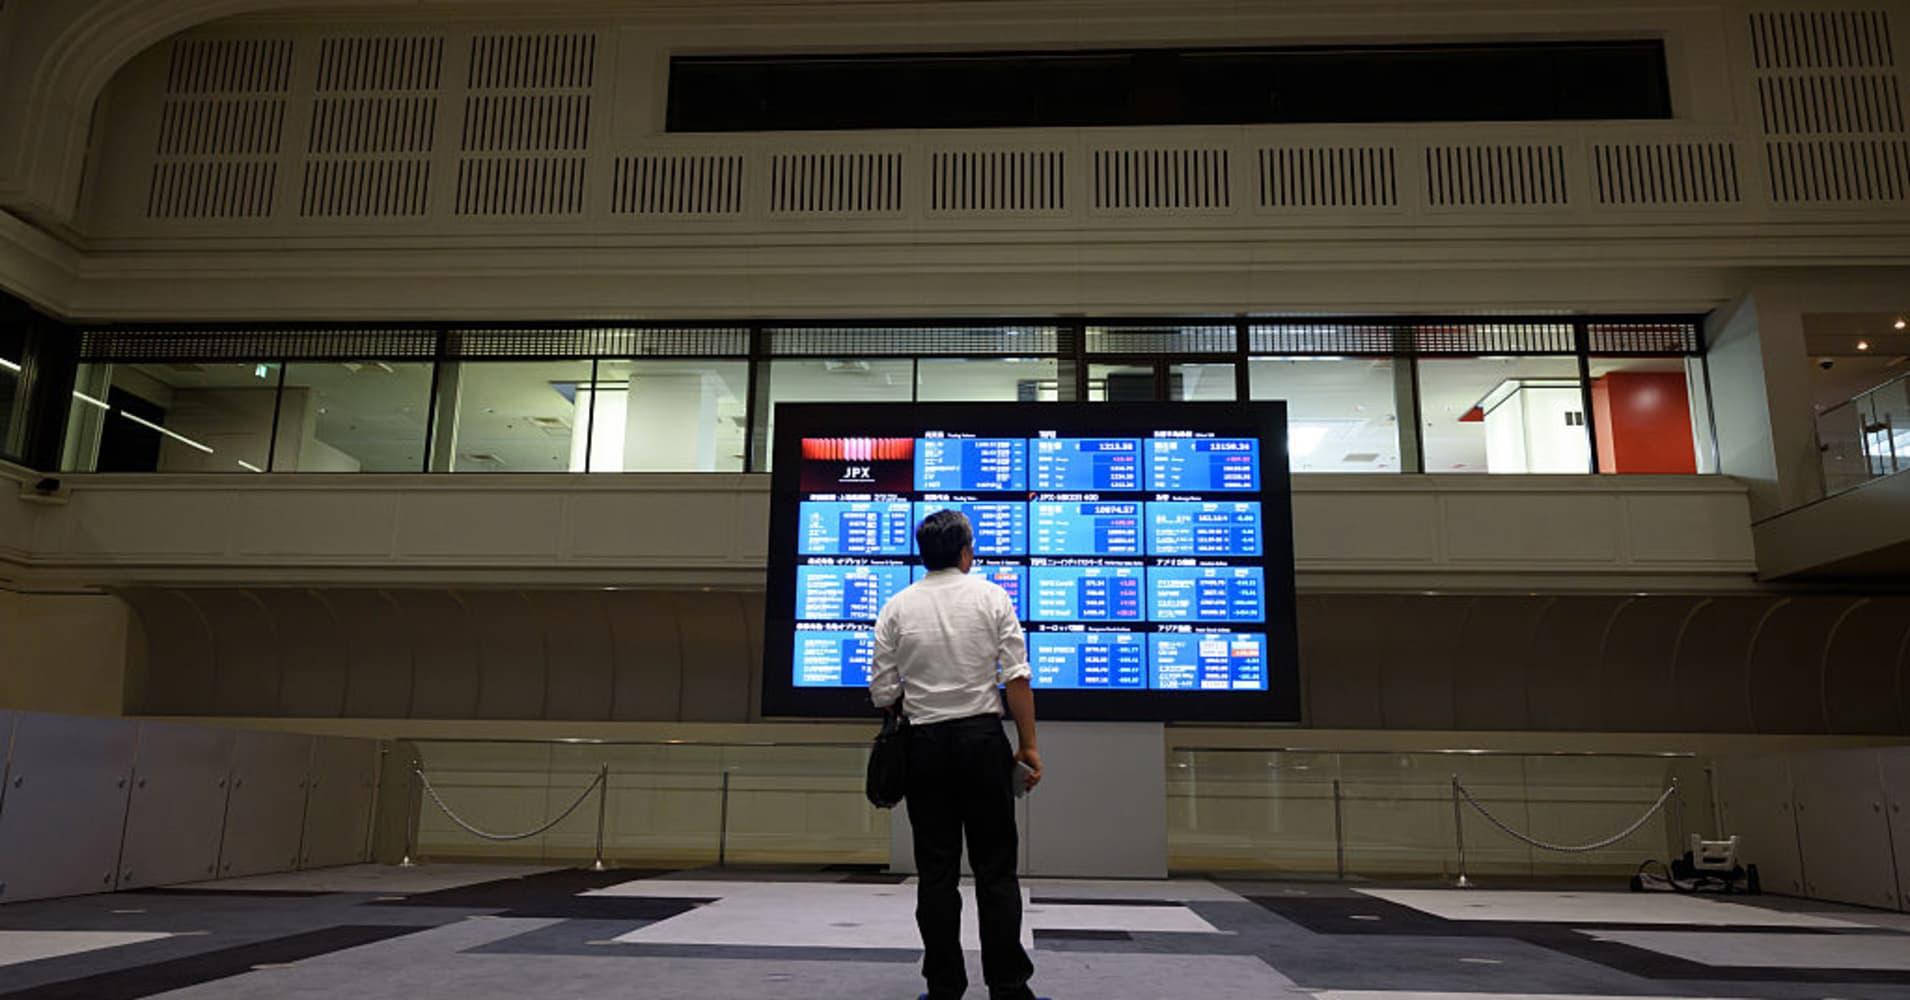 Asia stocks to focus on dollar strength, yen strength, higher oil prices, US market gains, Toyota earnings